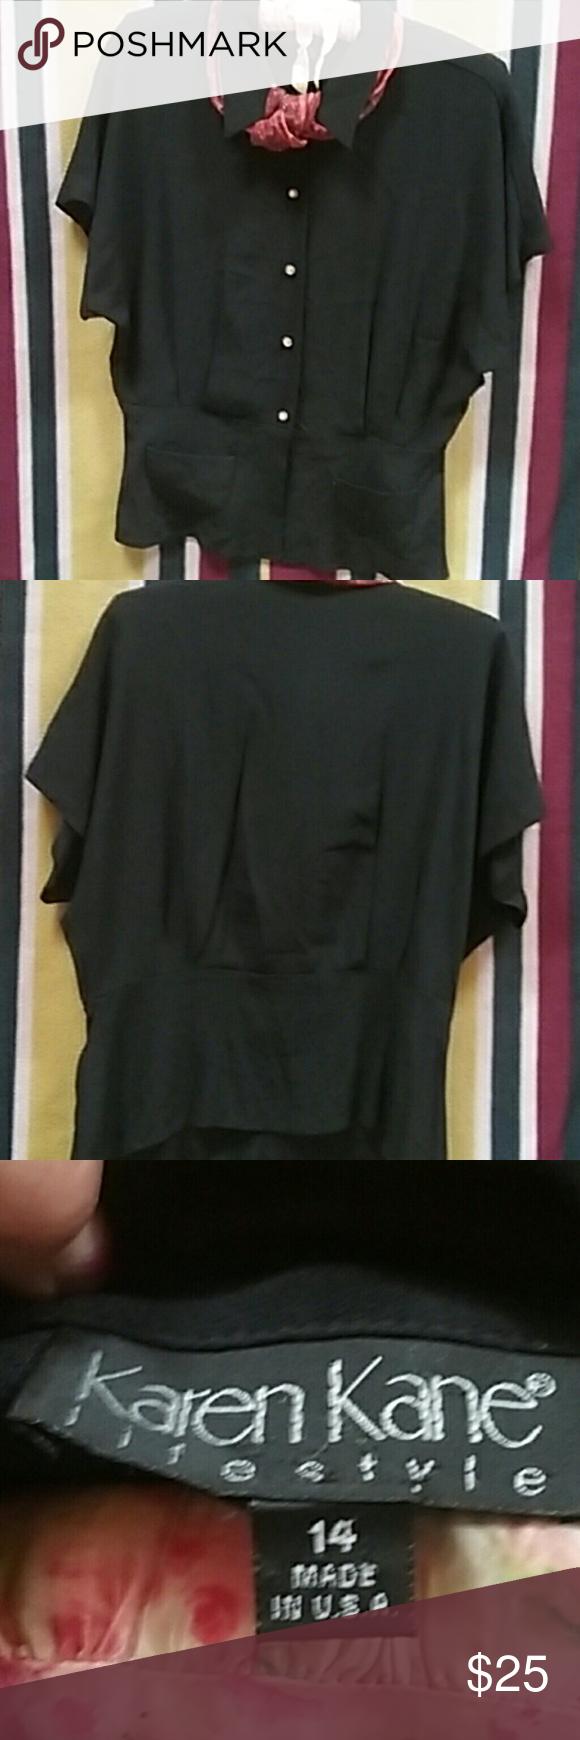 Top Vintage Karen Kane rhinestone button down short sleeve 2 pocket blouse. Tapered waistline excellent condition. vintage Karen kane Tops Blouses